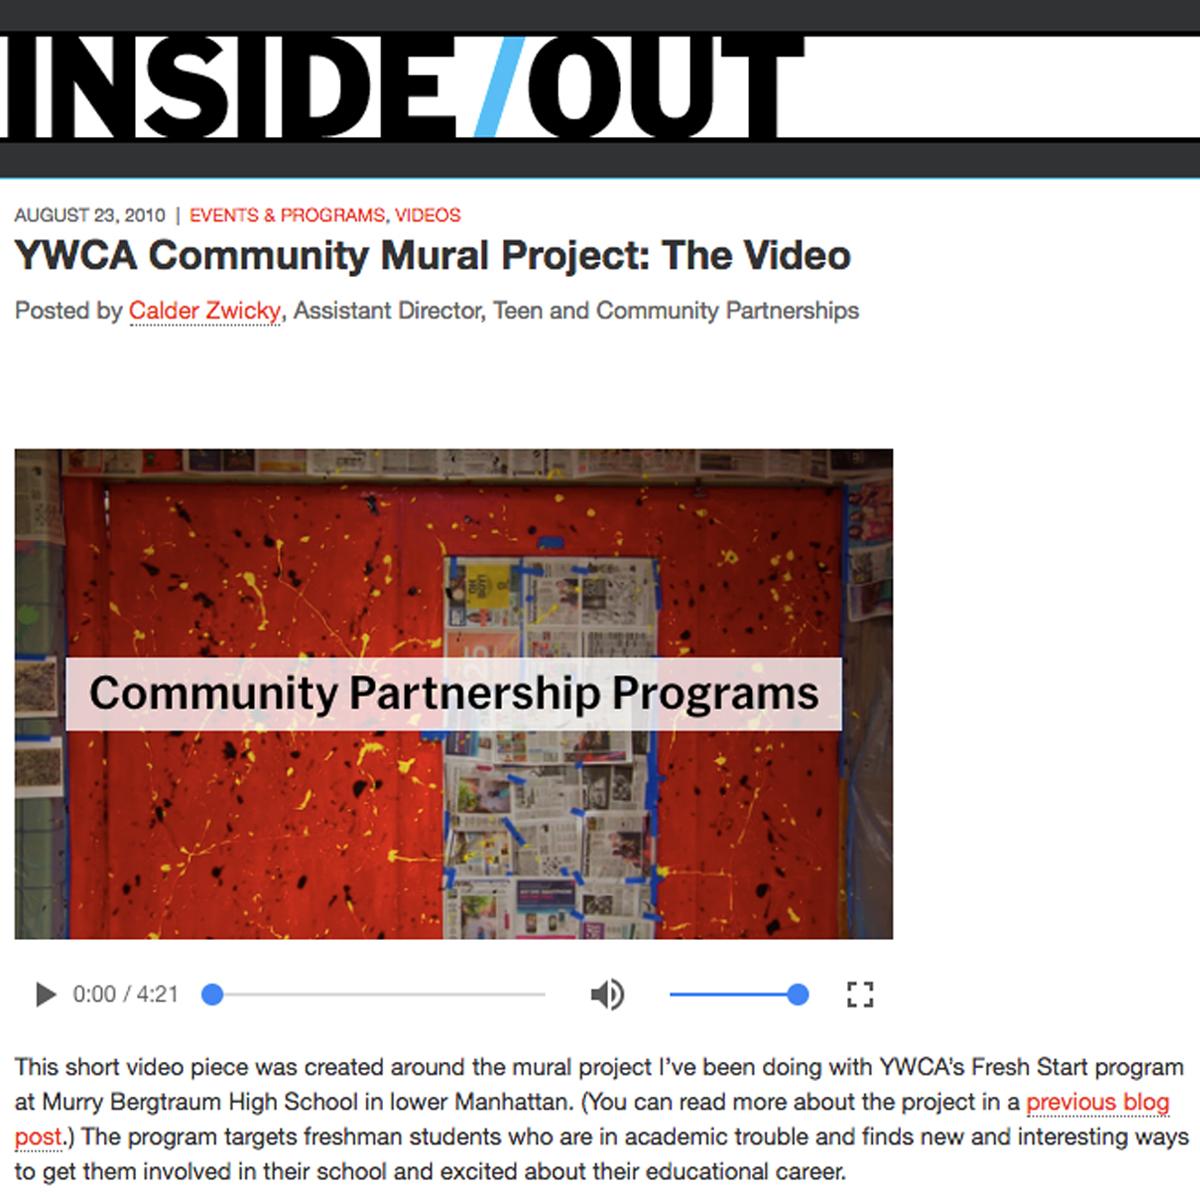 YWCA Community Mural Project